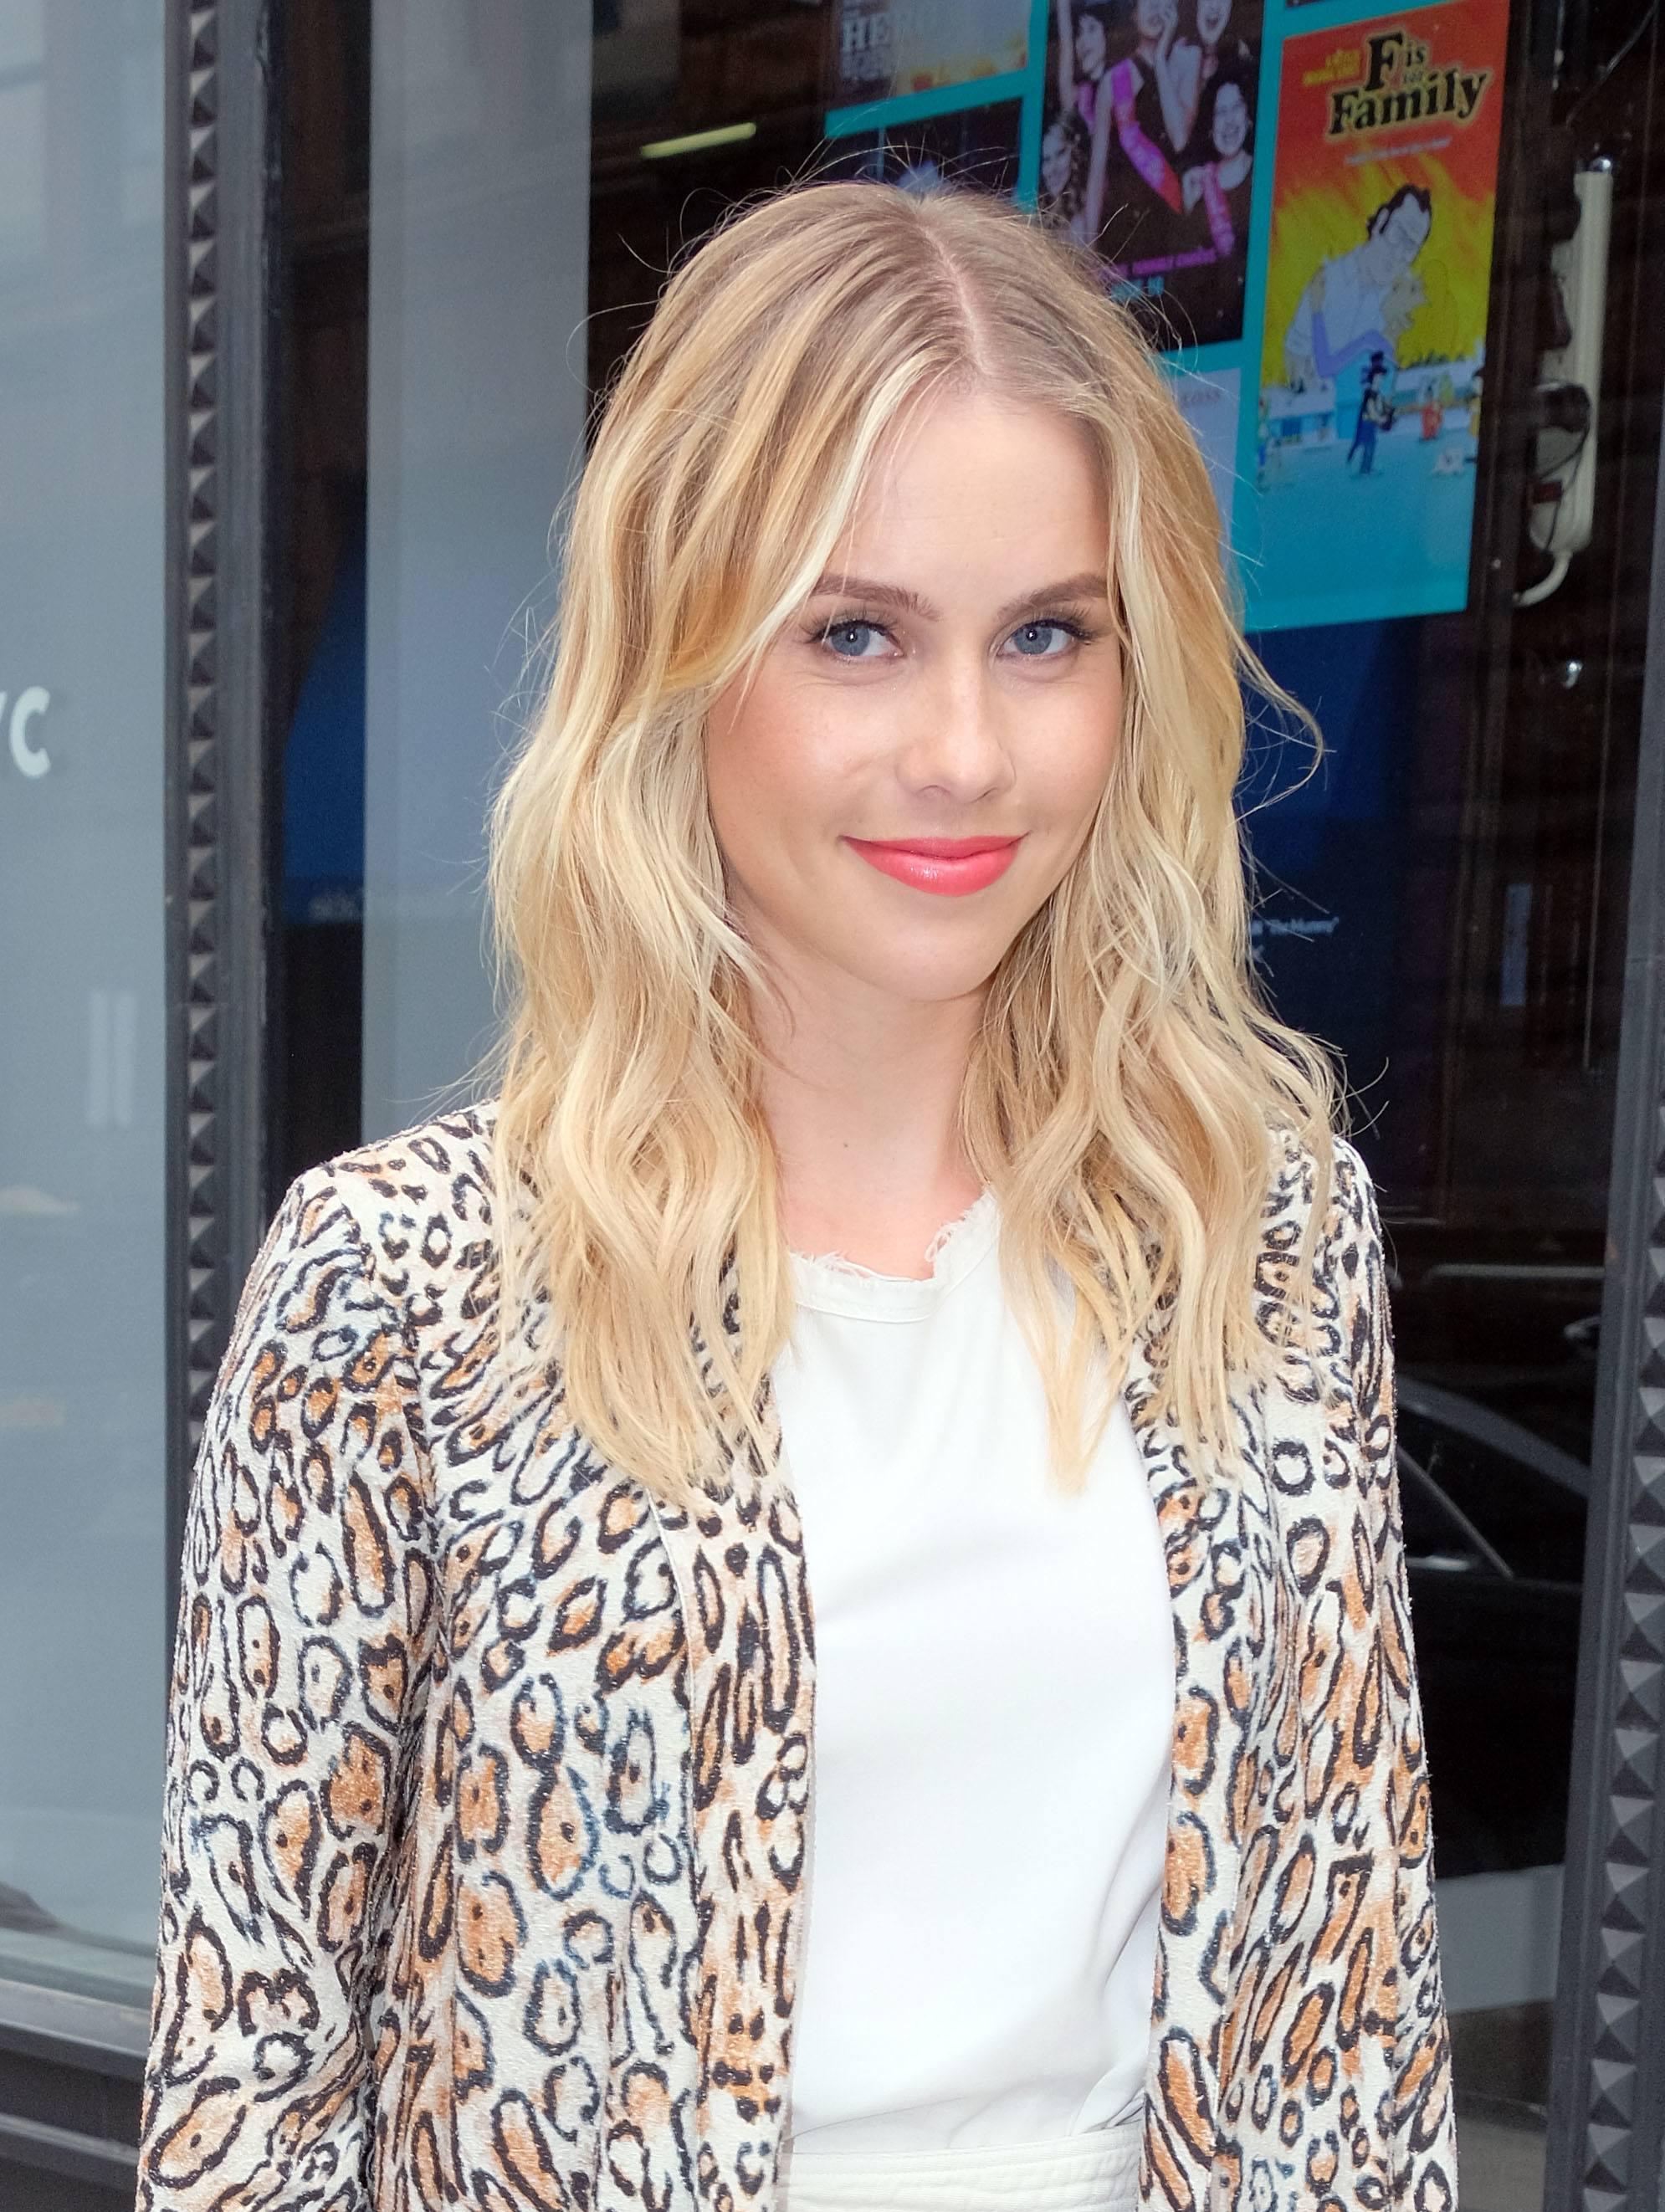 actress claire holt with medium length wavy cream soda blonde hair